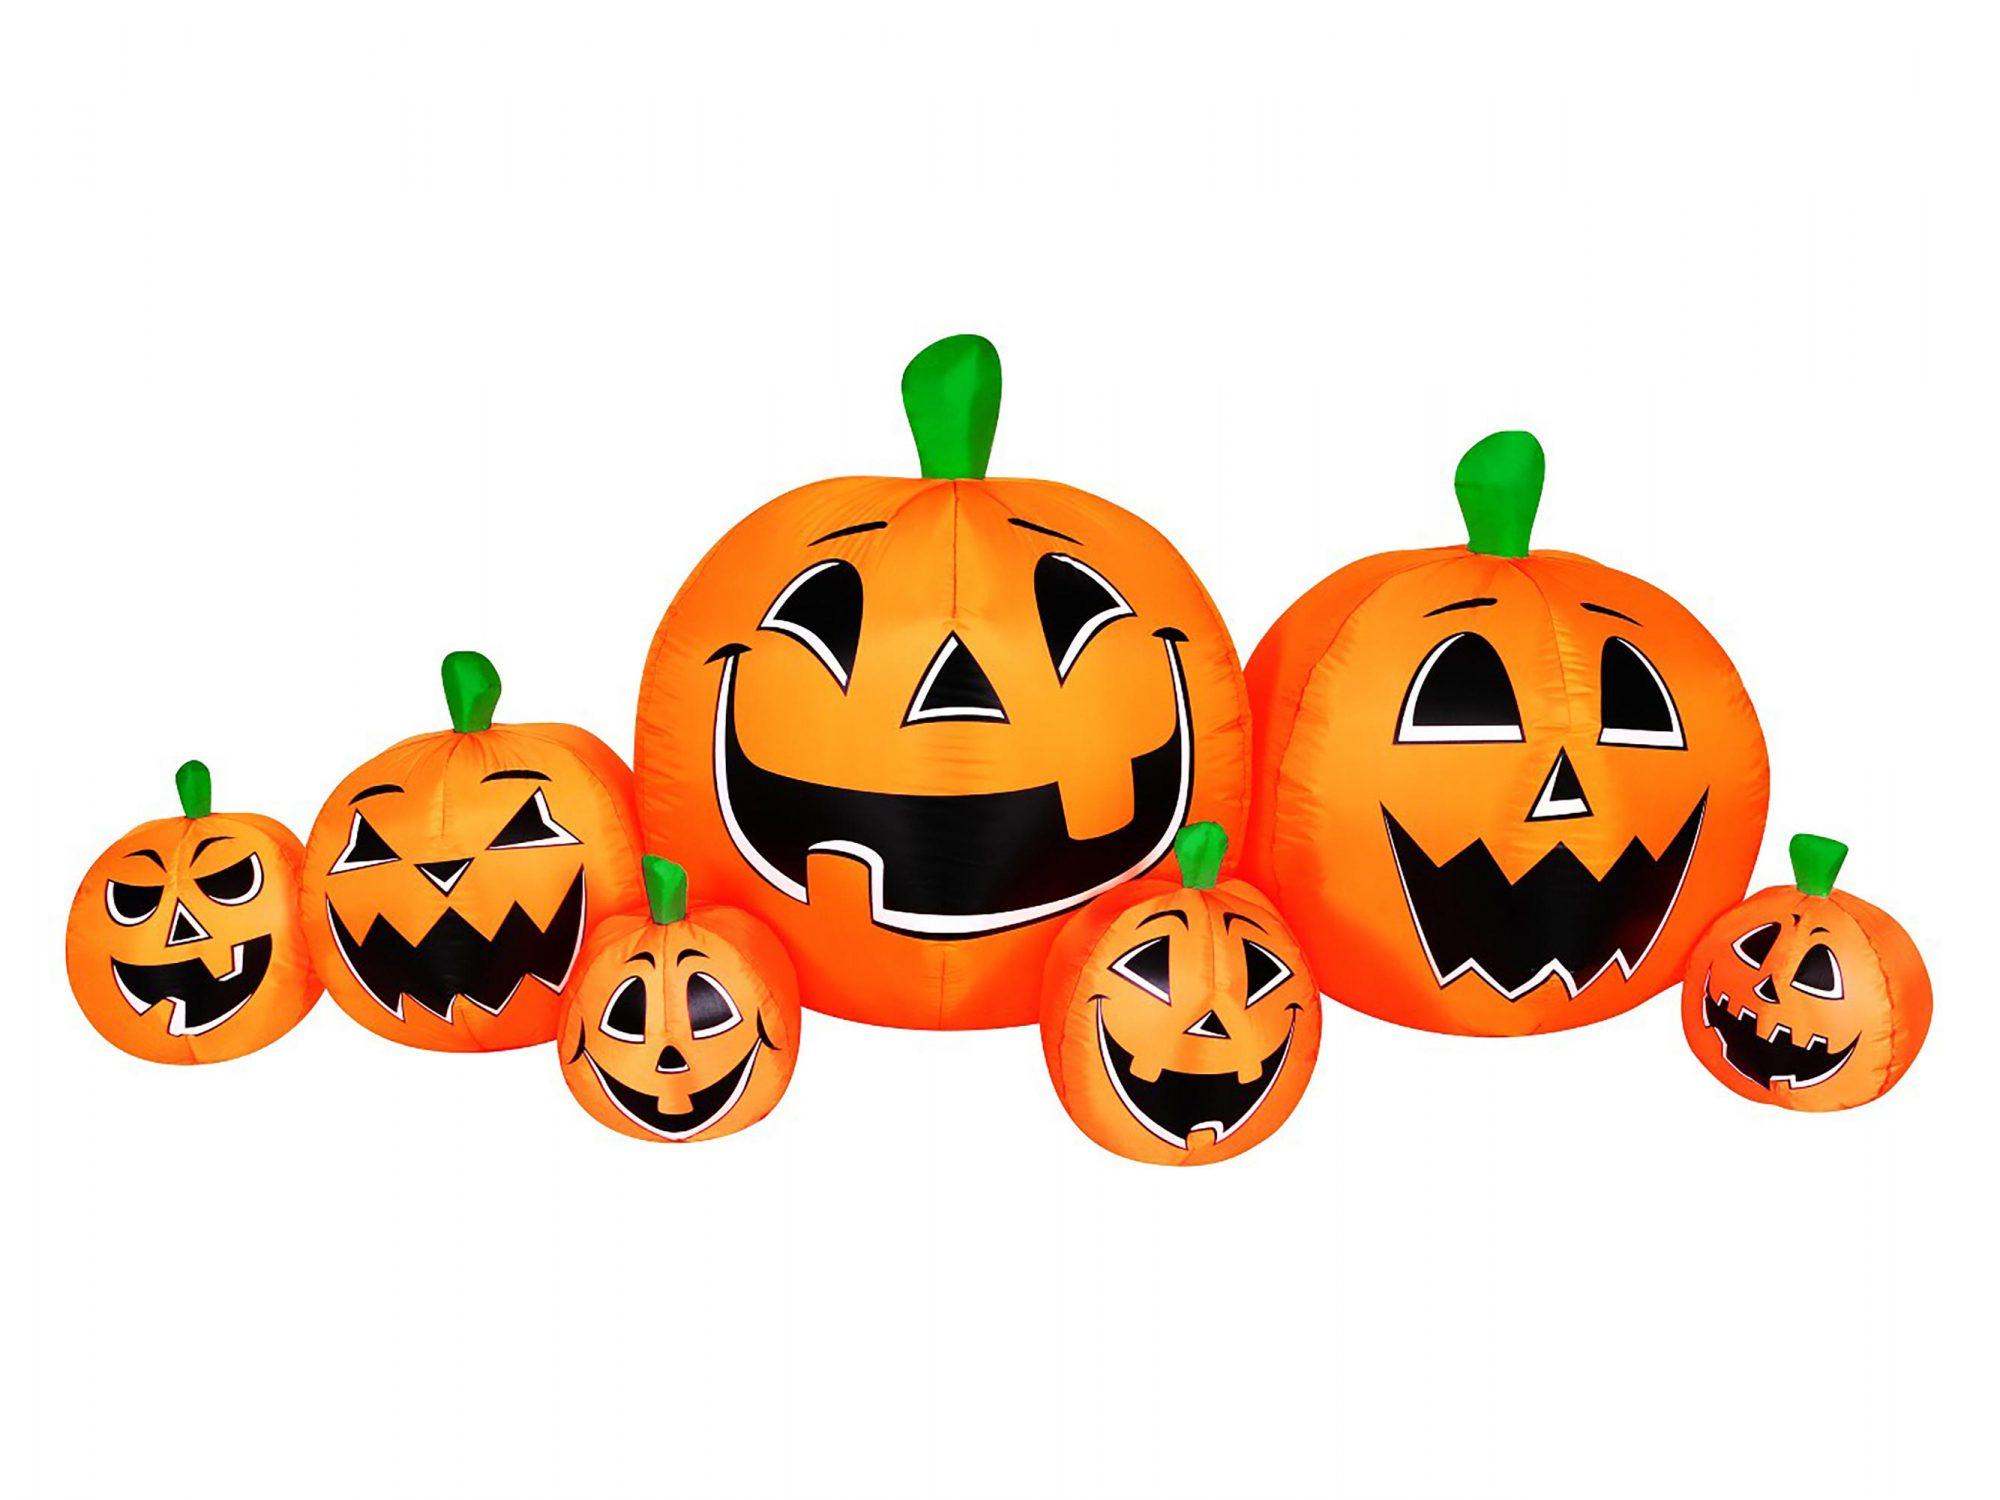 Pumpkin Patch Inflatable